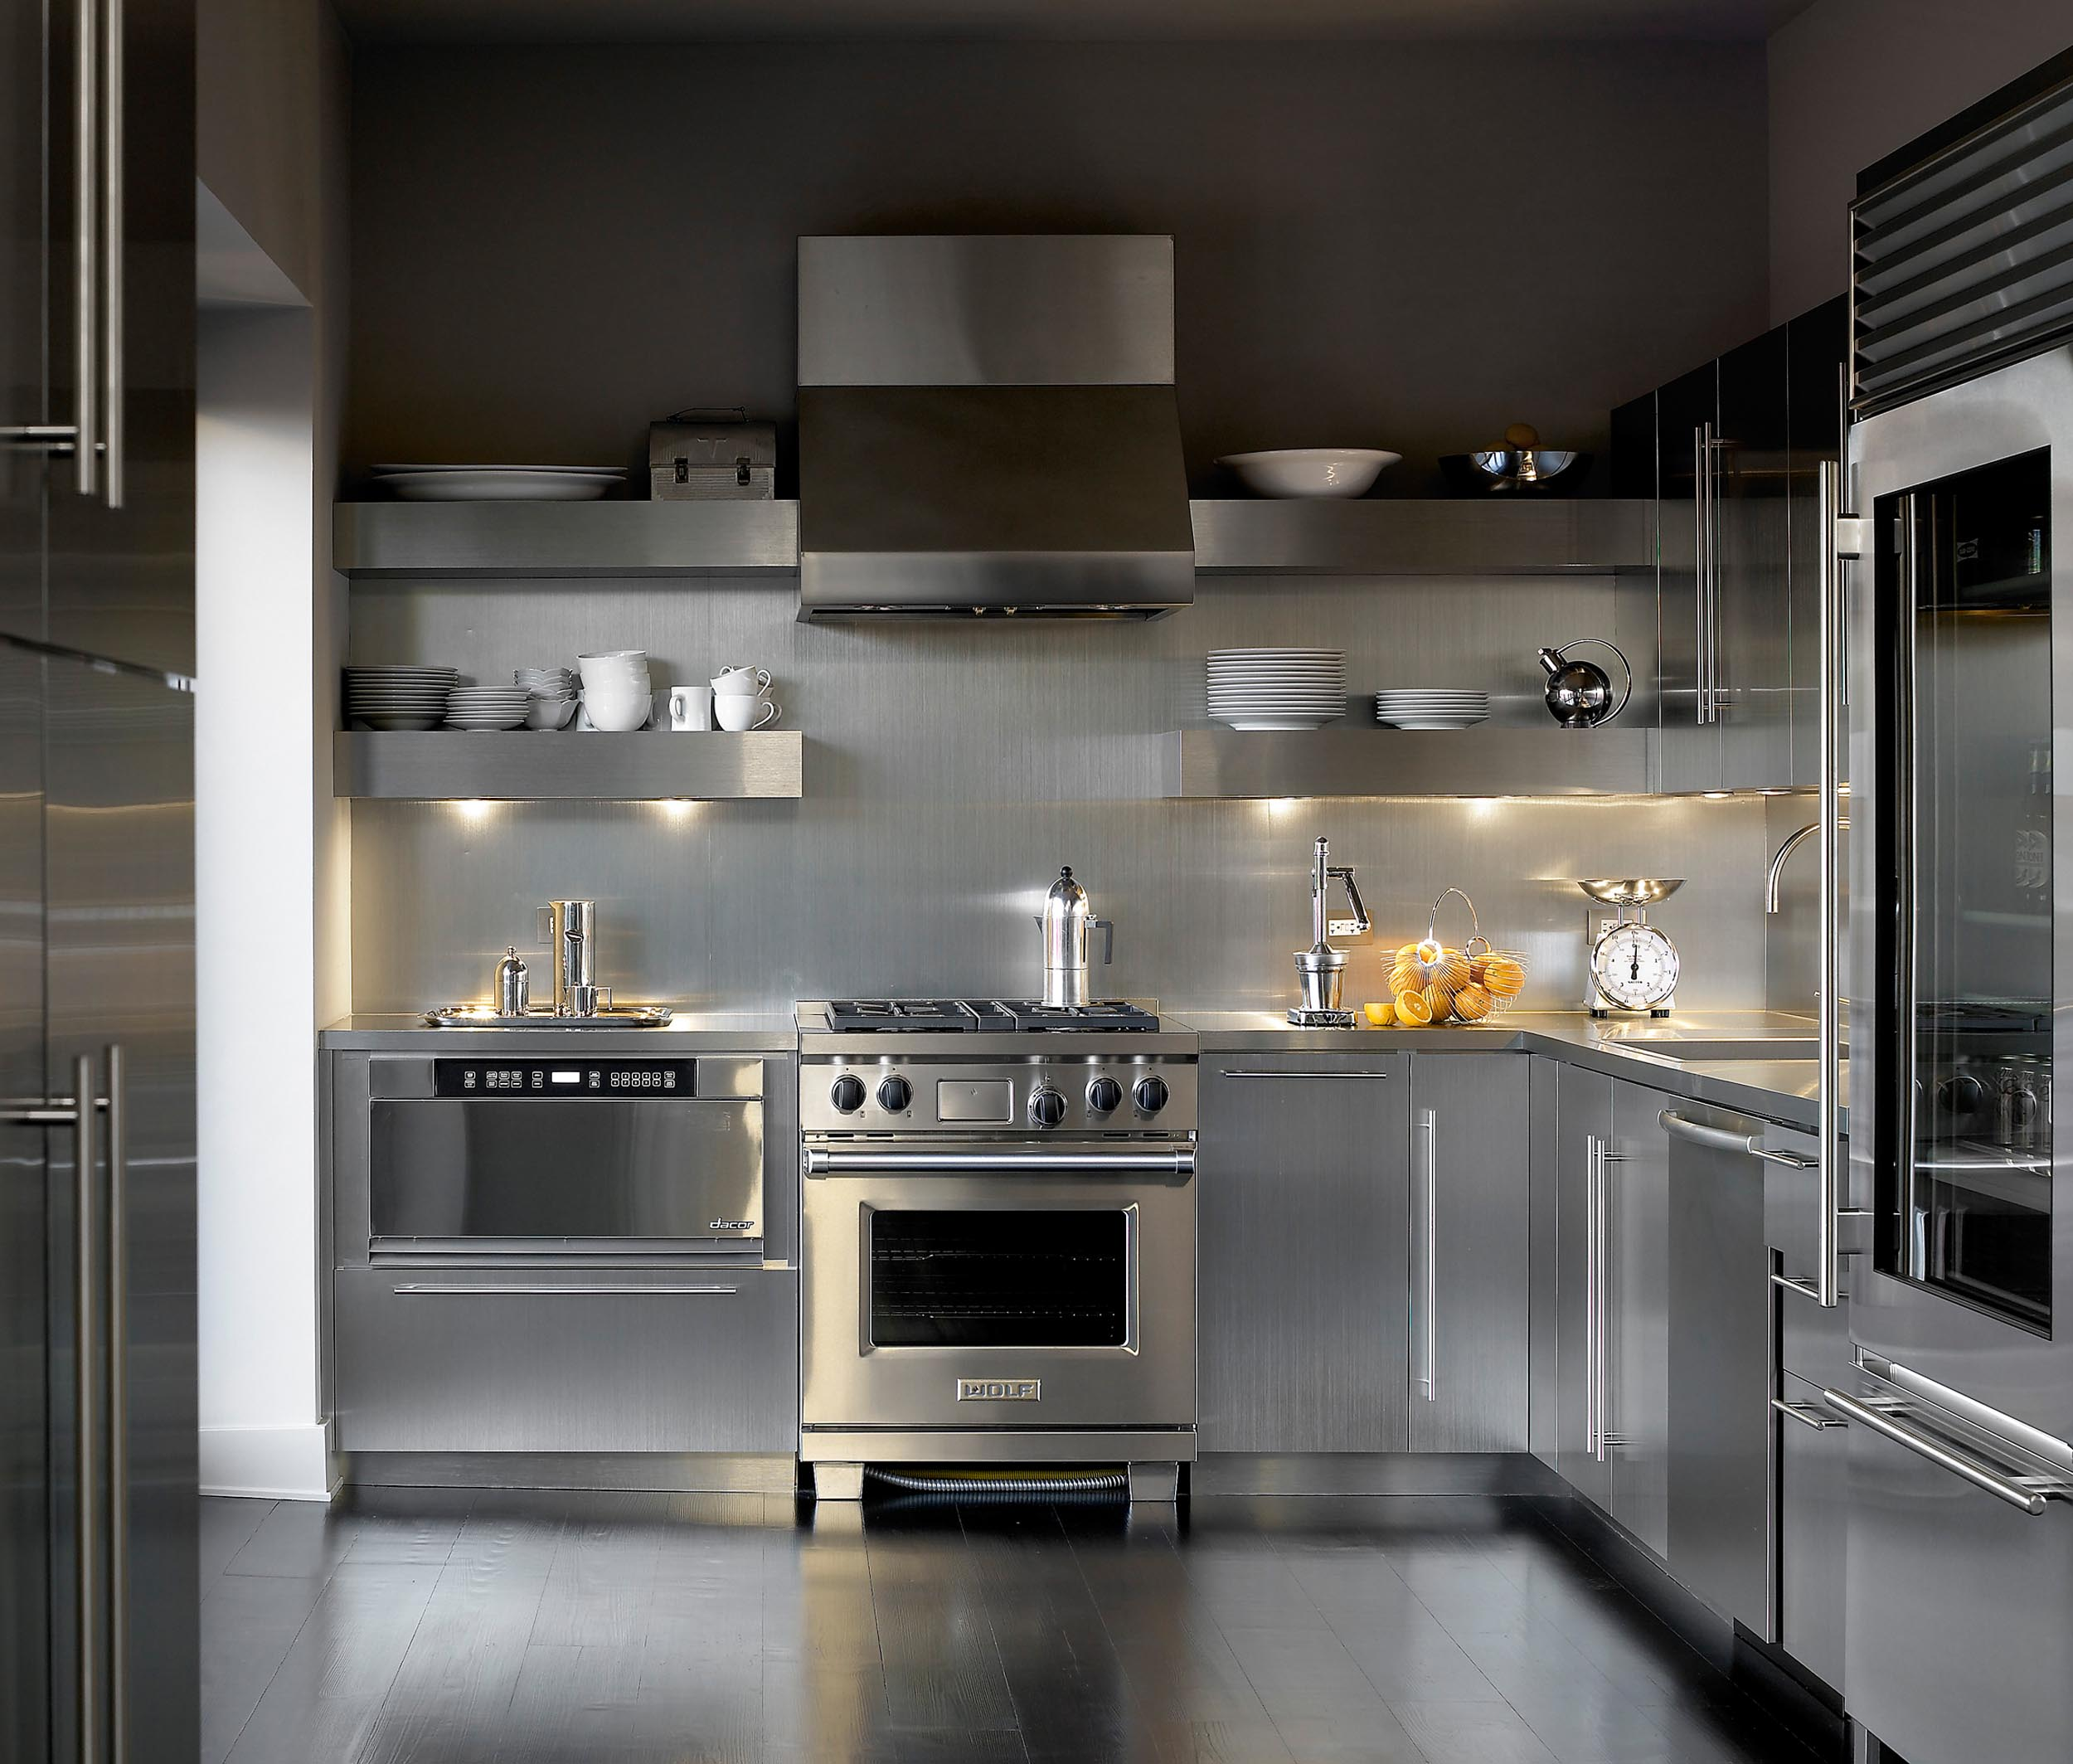 Leo_Designs_Chicago_interior_design_contemporary_inspired_nail_factory_conversion14.jpg